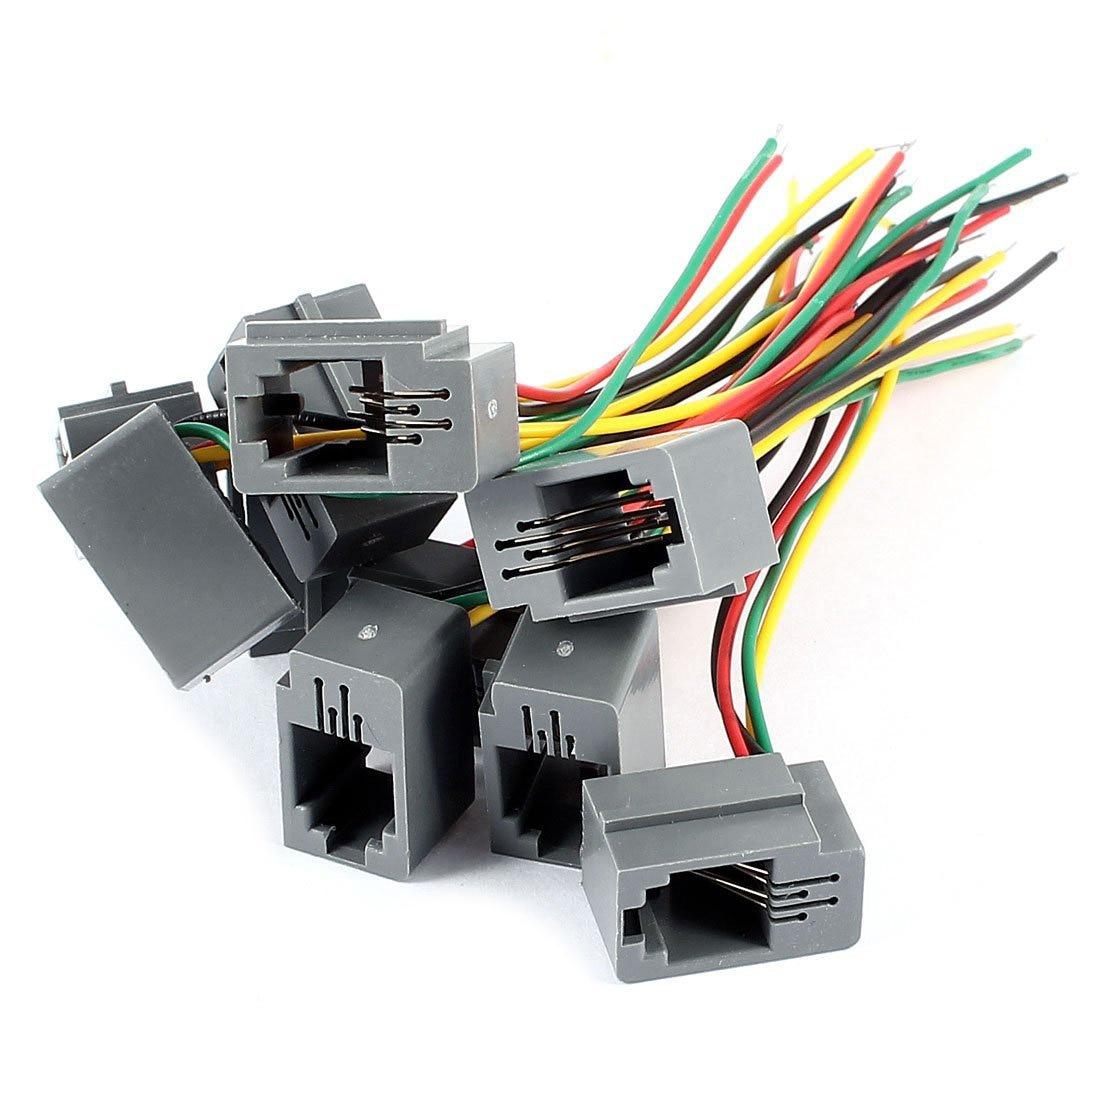 10 pcs 616e 4p4c rj9 female telephone connector adapter w 4 wires 8cm [ 1100 x 1100 Pixel ]